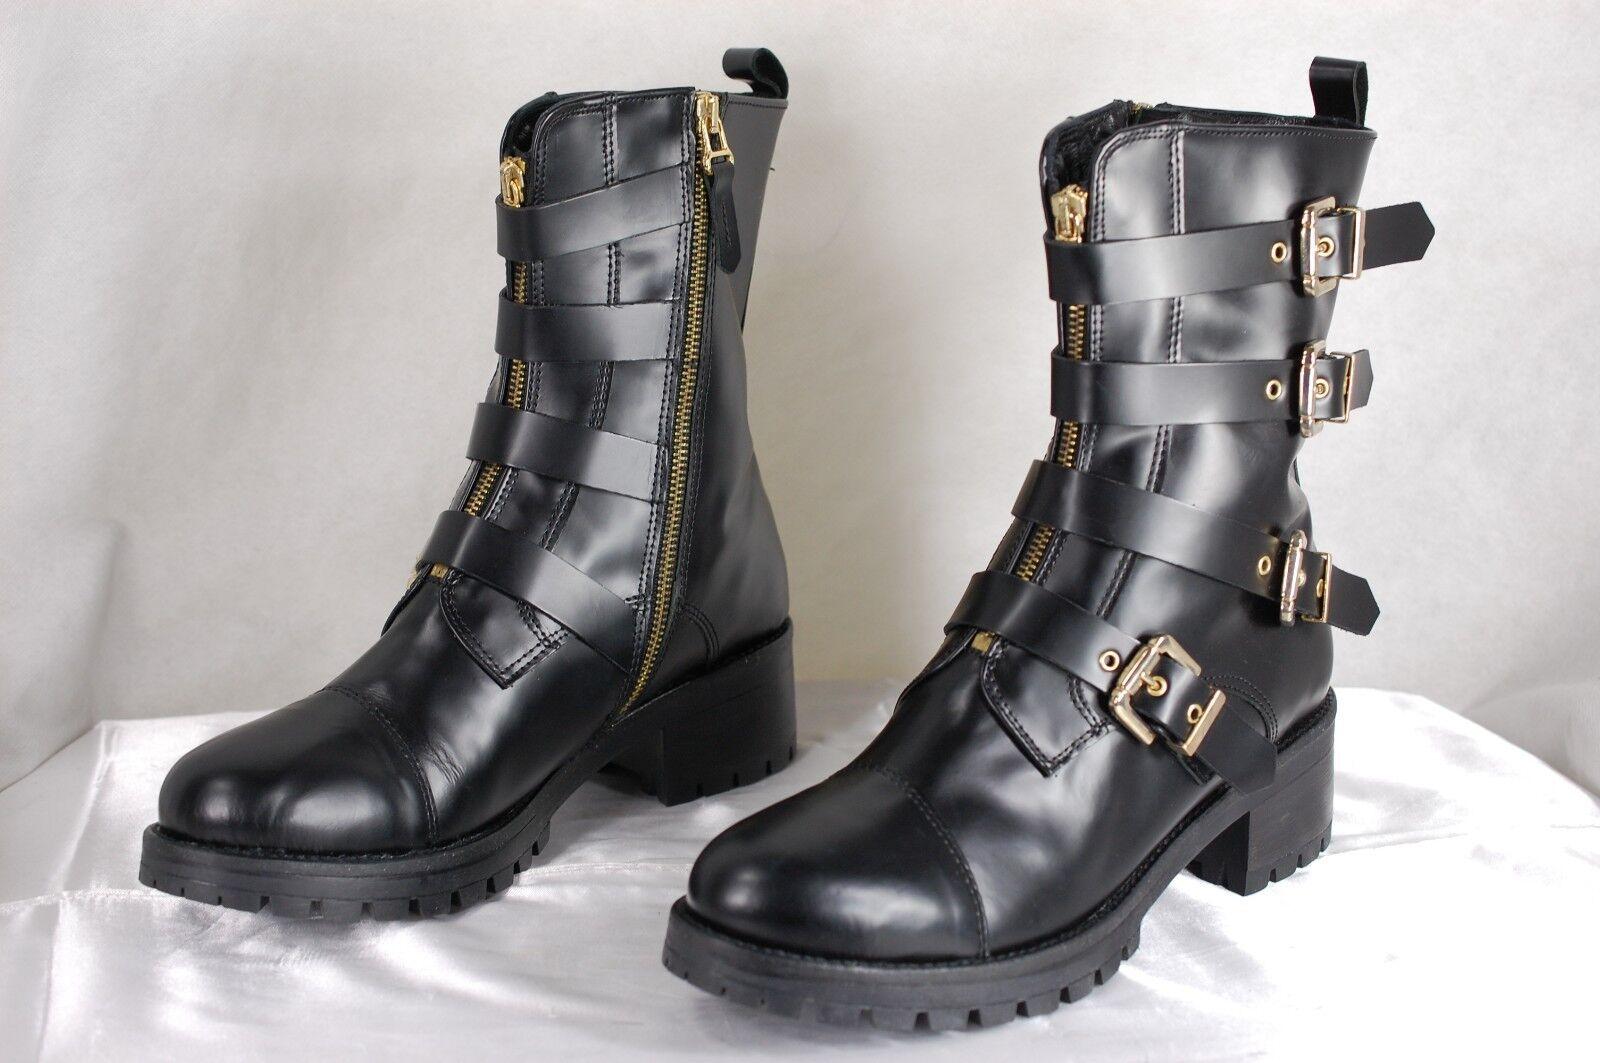 CHIARA FERRAGNI MADE IN ITALY 'BRAD' WOMEN BLACK BIKER RIDING 7 Stiefel EU 37 US 7 RIDING f4af66